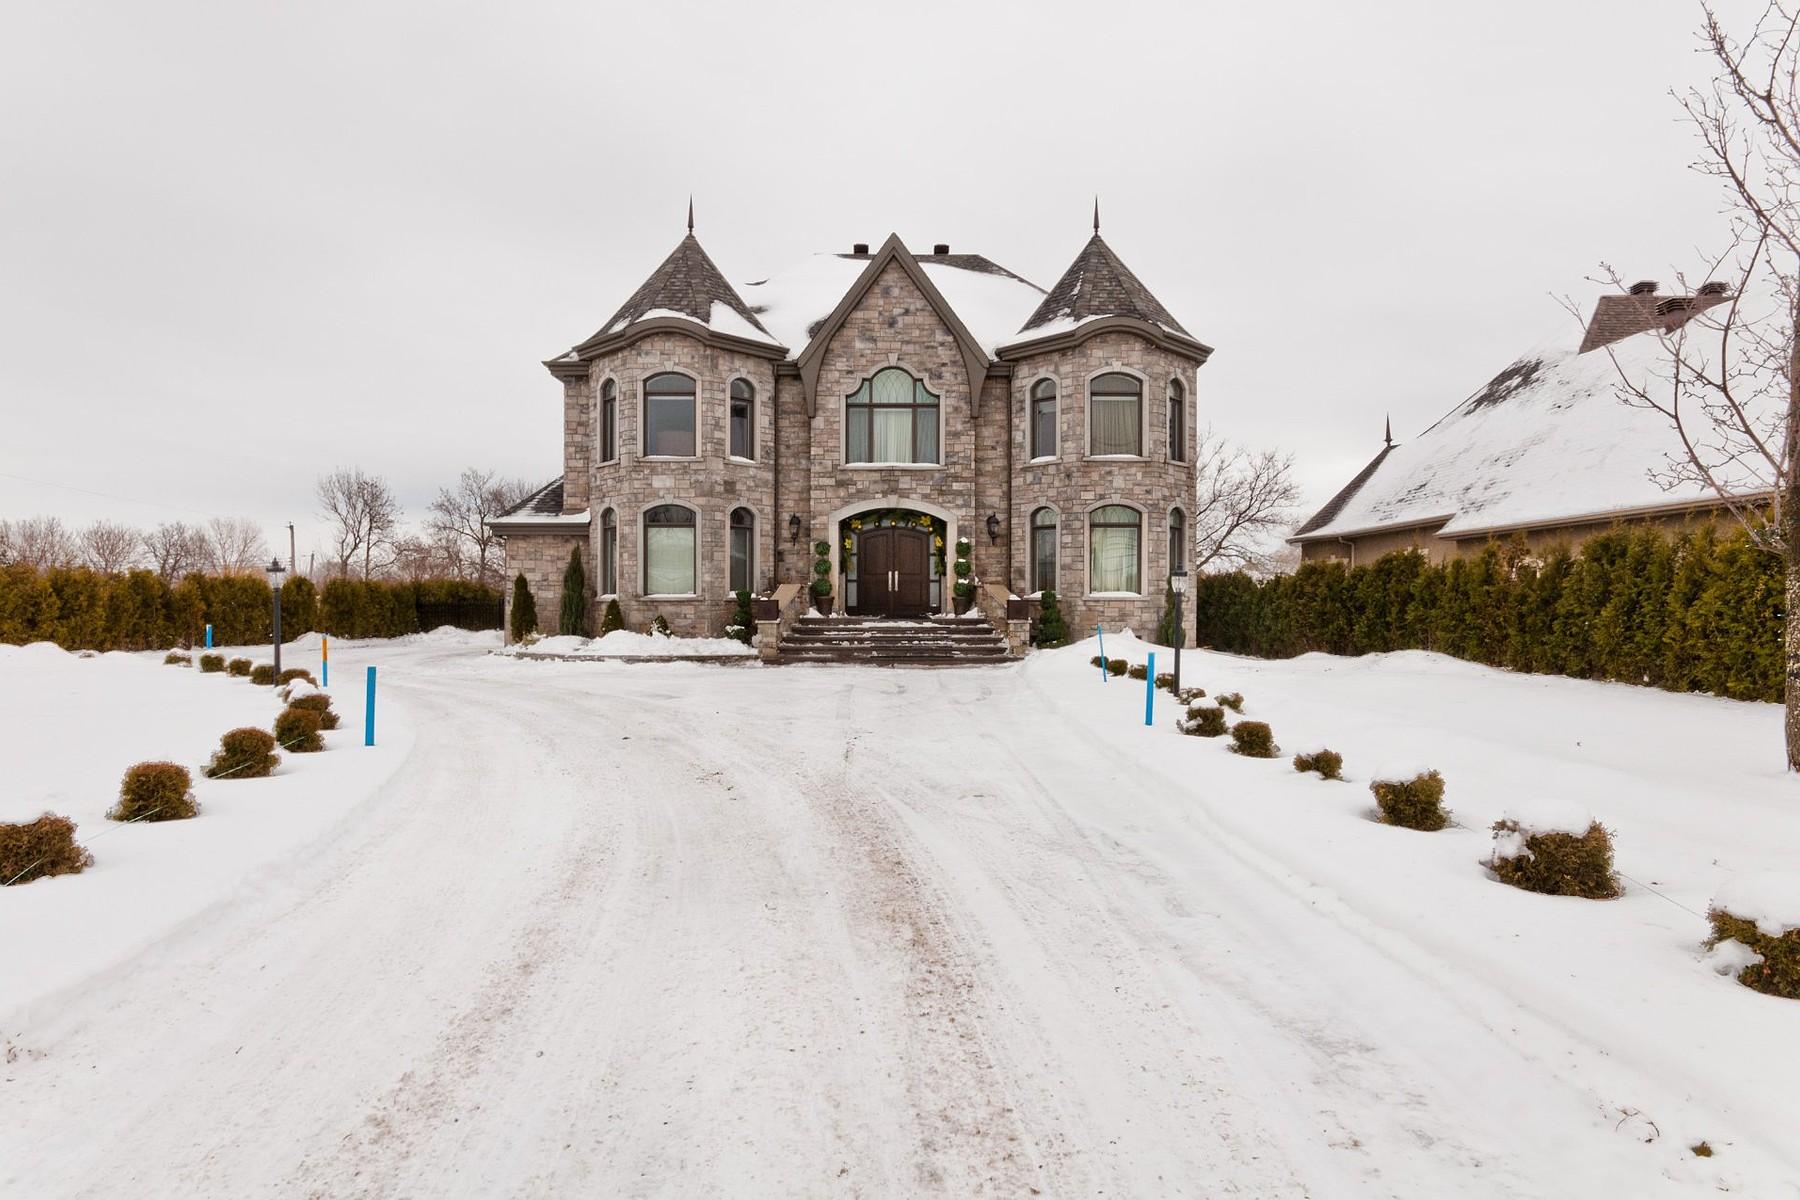 Các loại nhà khác vì Bán tại Le Gardeur (Repentigny), Lanaudière 32 Boul. Lacombe Le Gardeur, Quebec J5Z1R4 Canada